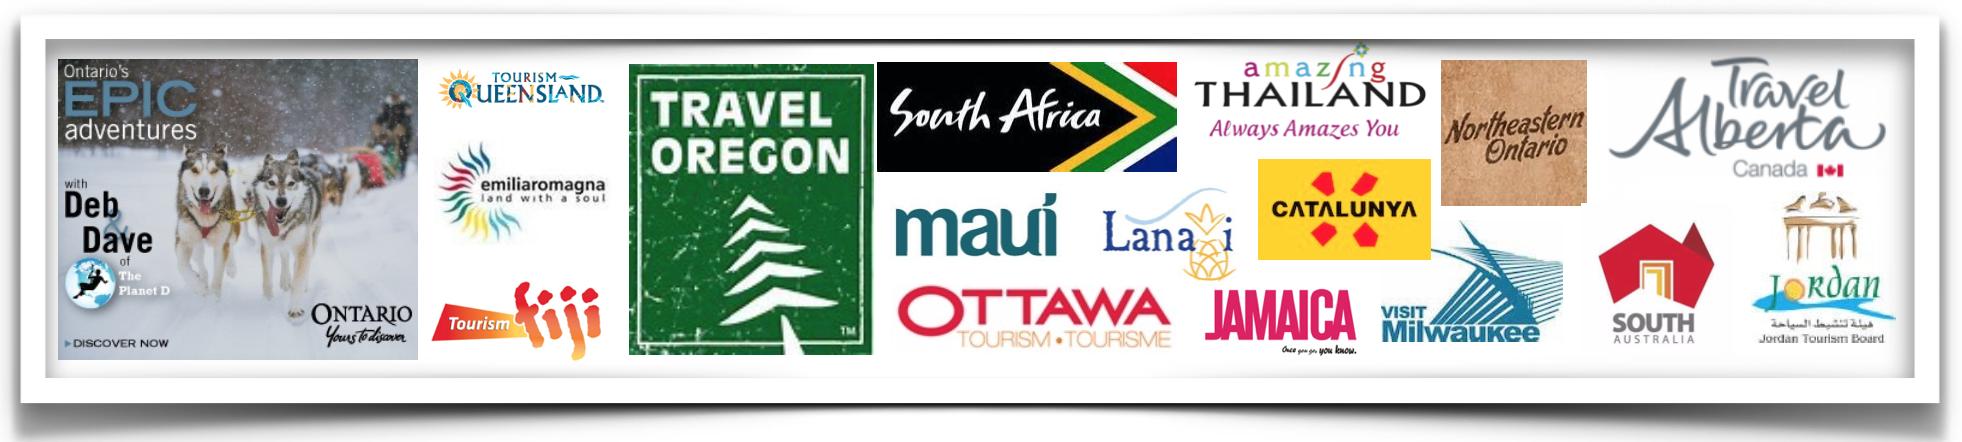 theplanetd sponsorshipss